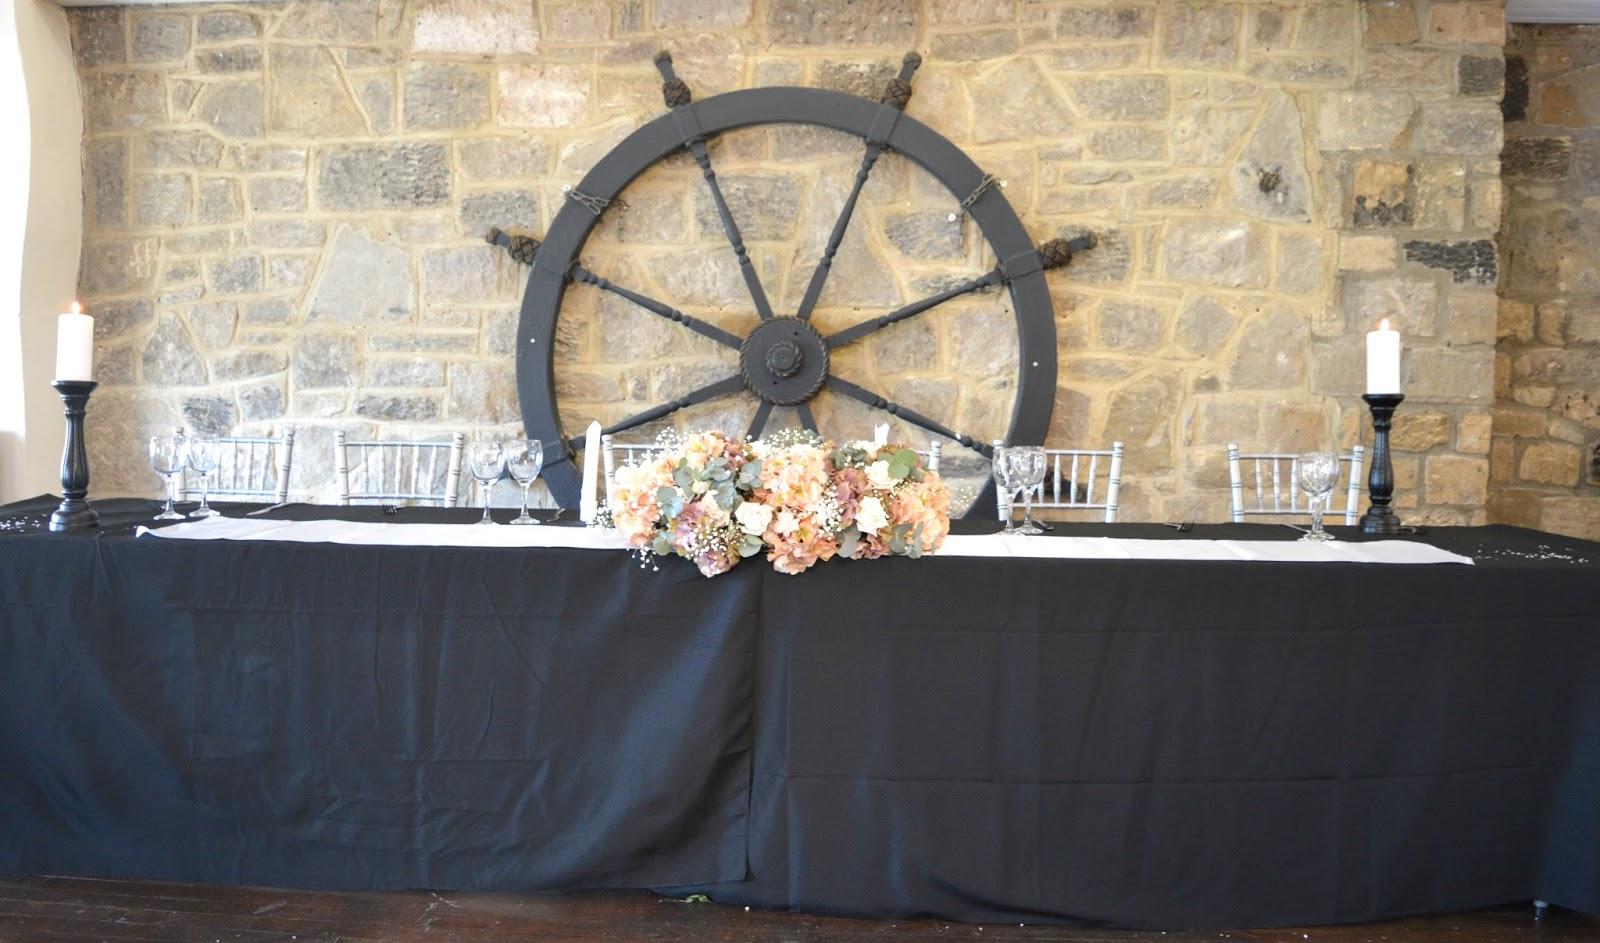 Weddings at Webster's Ropery, Sunderland: A North East Wedding Venue